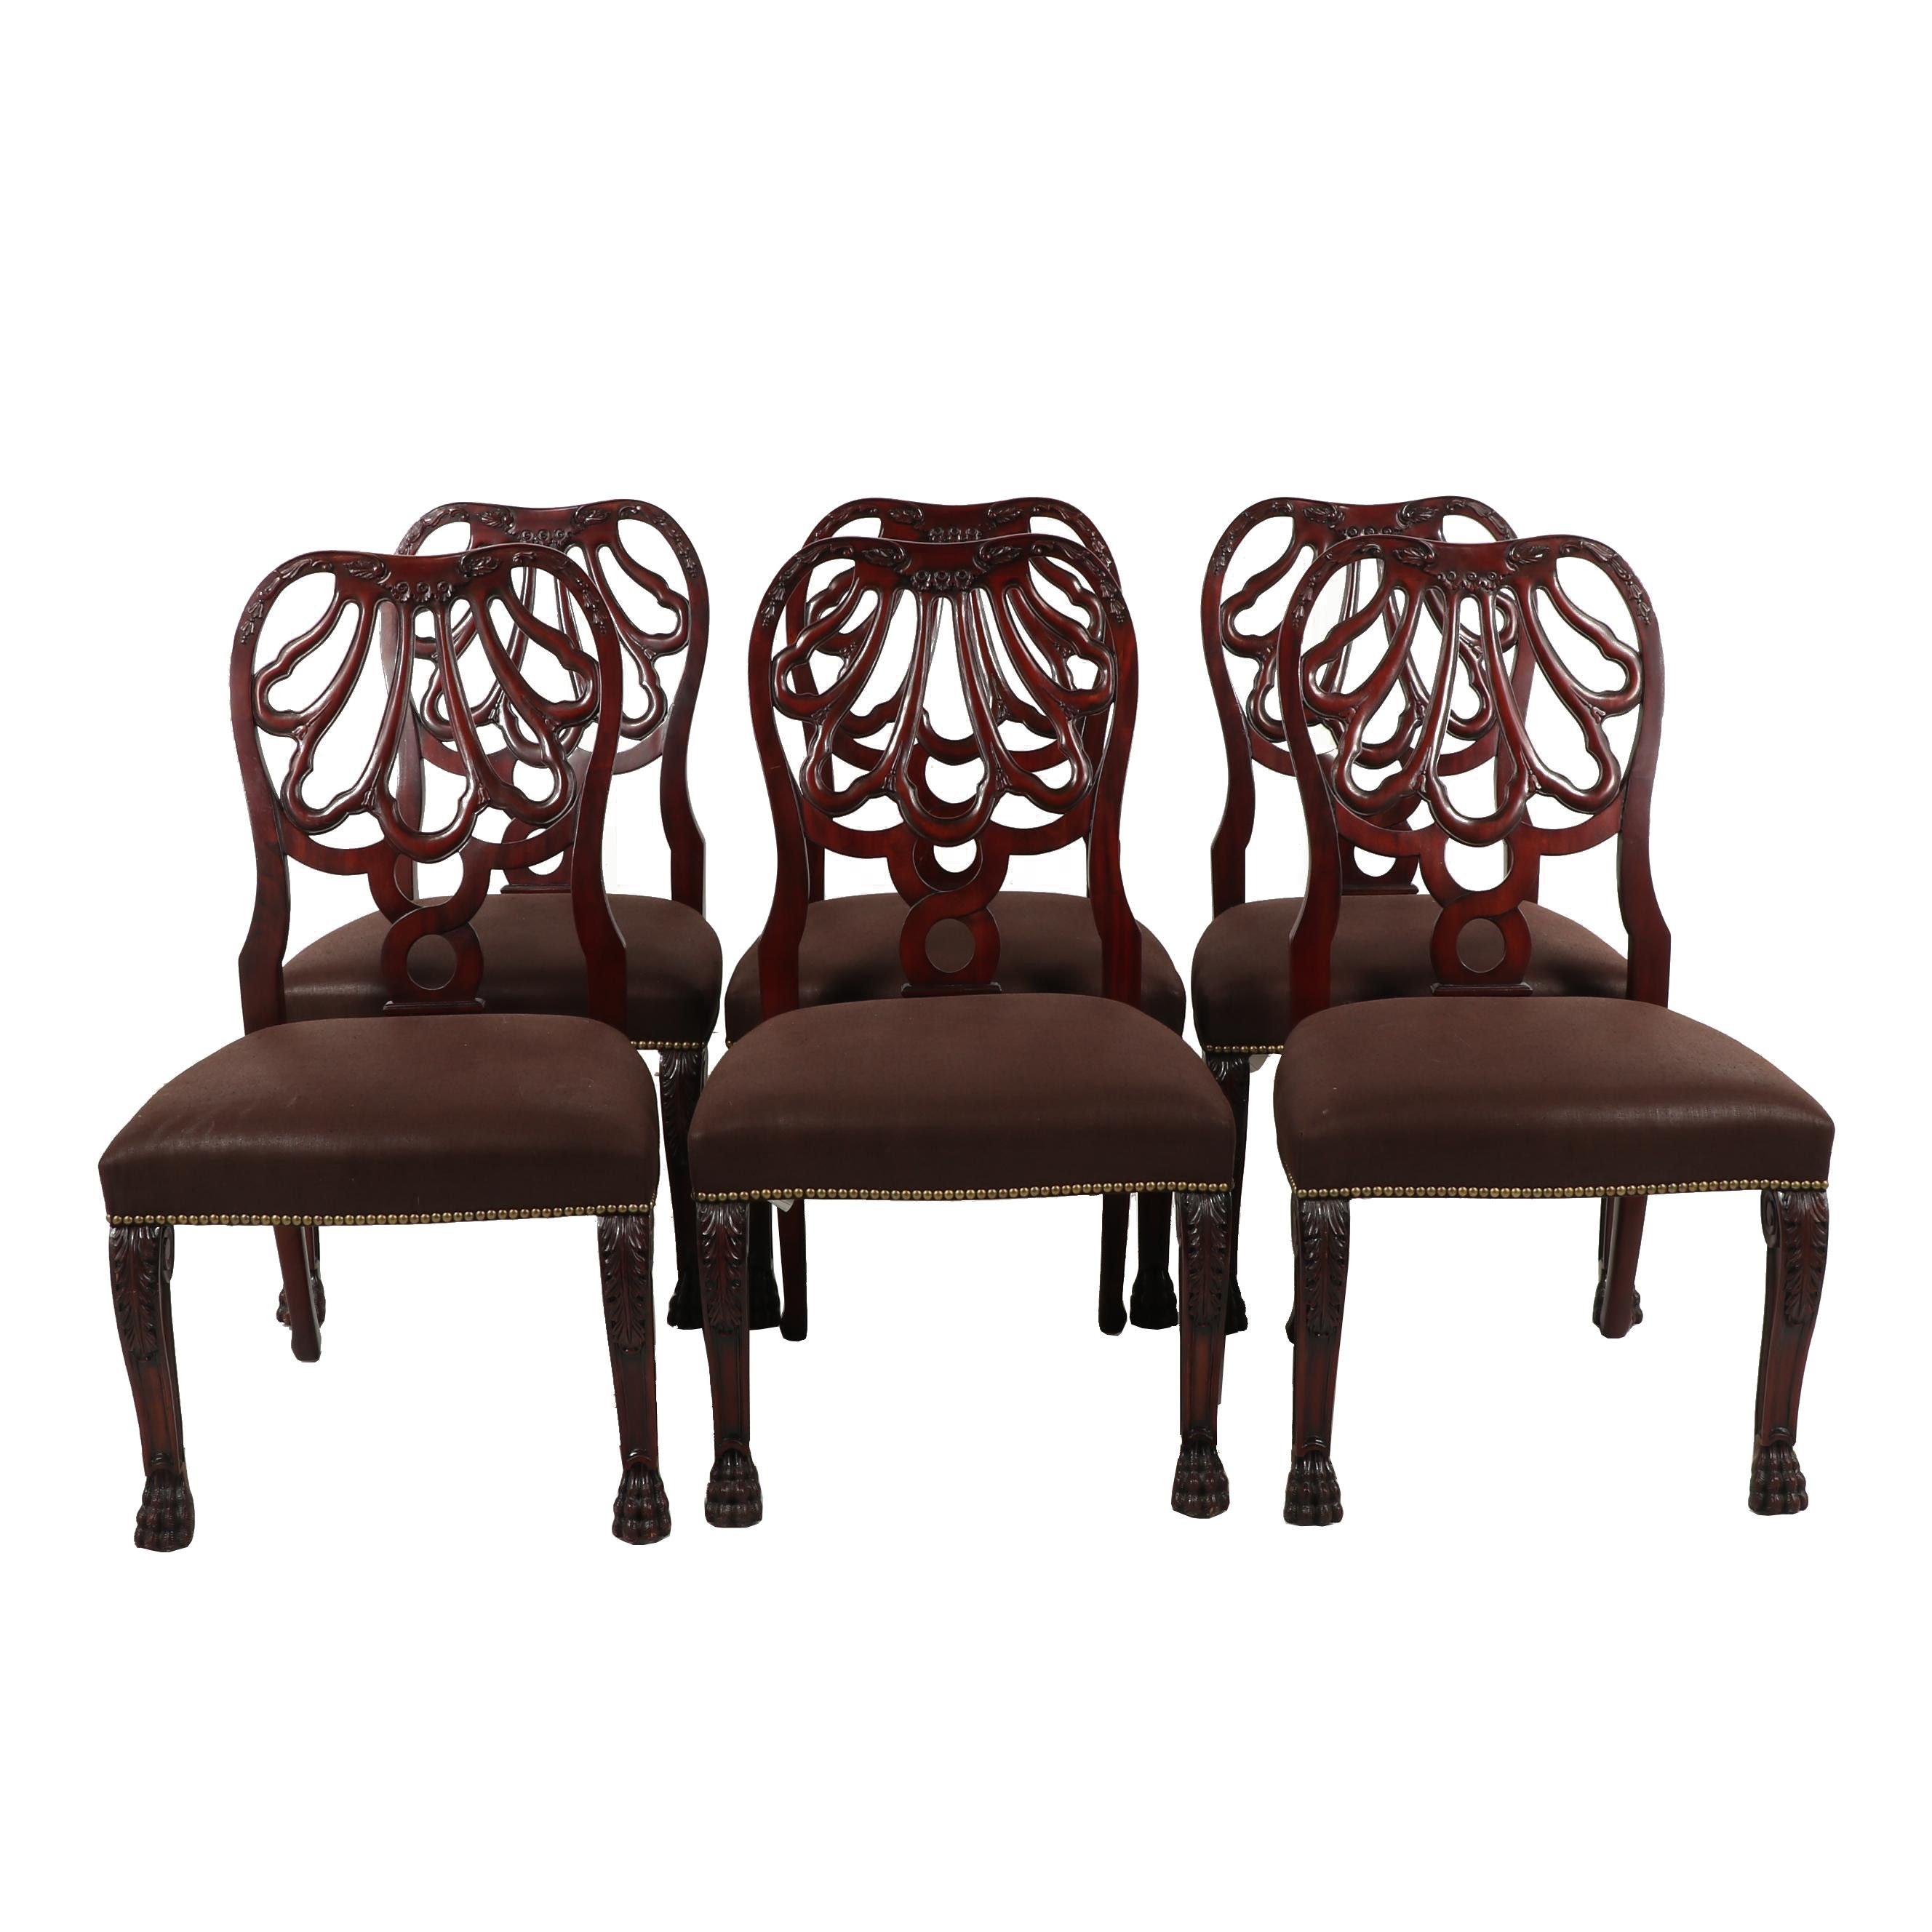 Set of six Ralph Lauren Dining Chairs